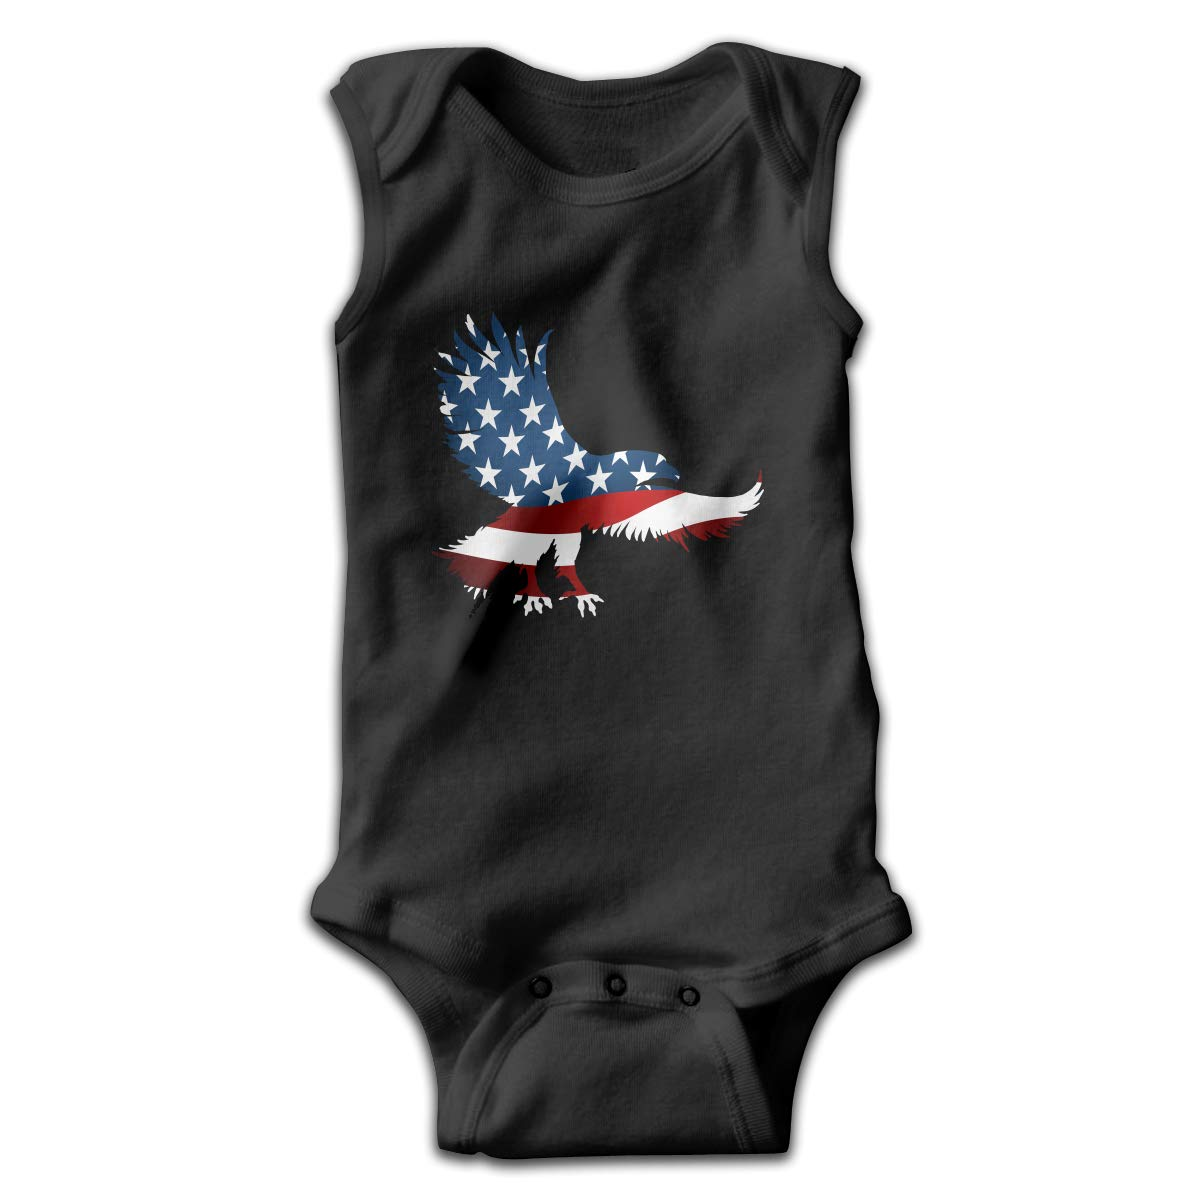 Infant Baby Girls Rompers Sleeveless Cotton Jumpsuit,American Eagle Flag Bodysuit Summer Pajamas